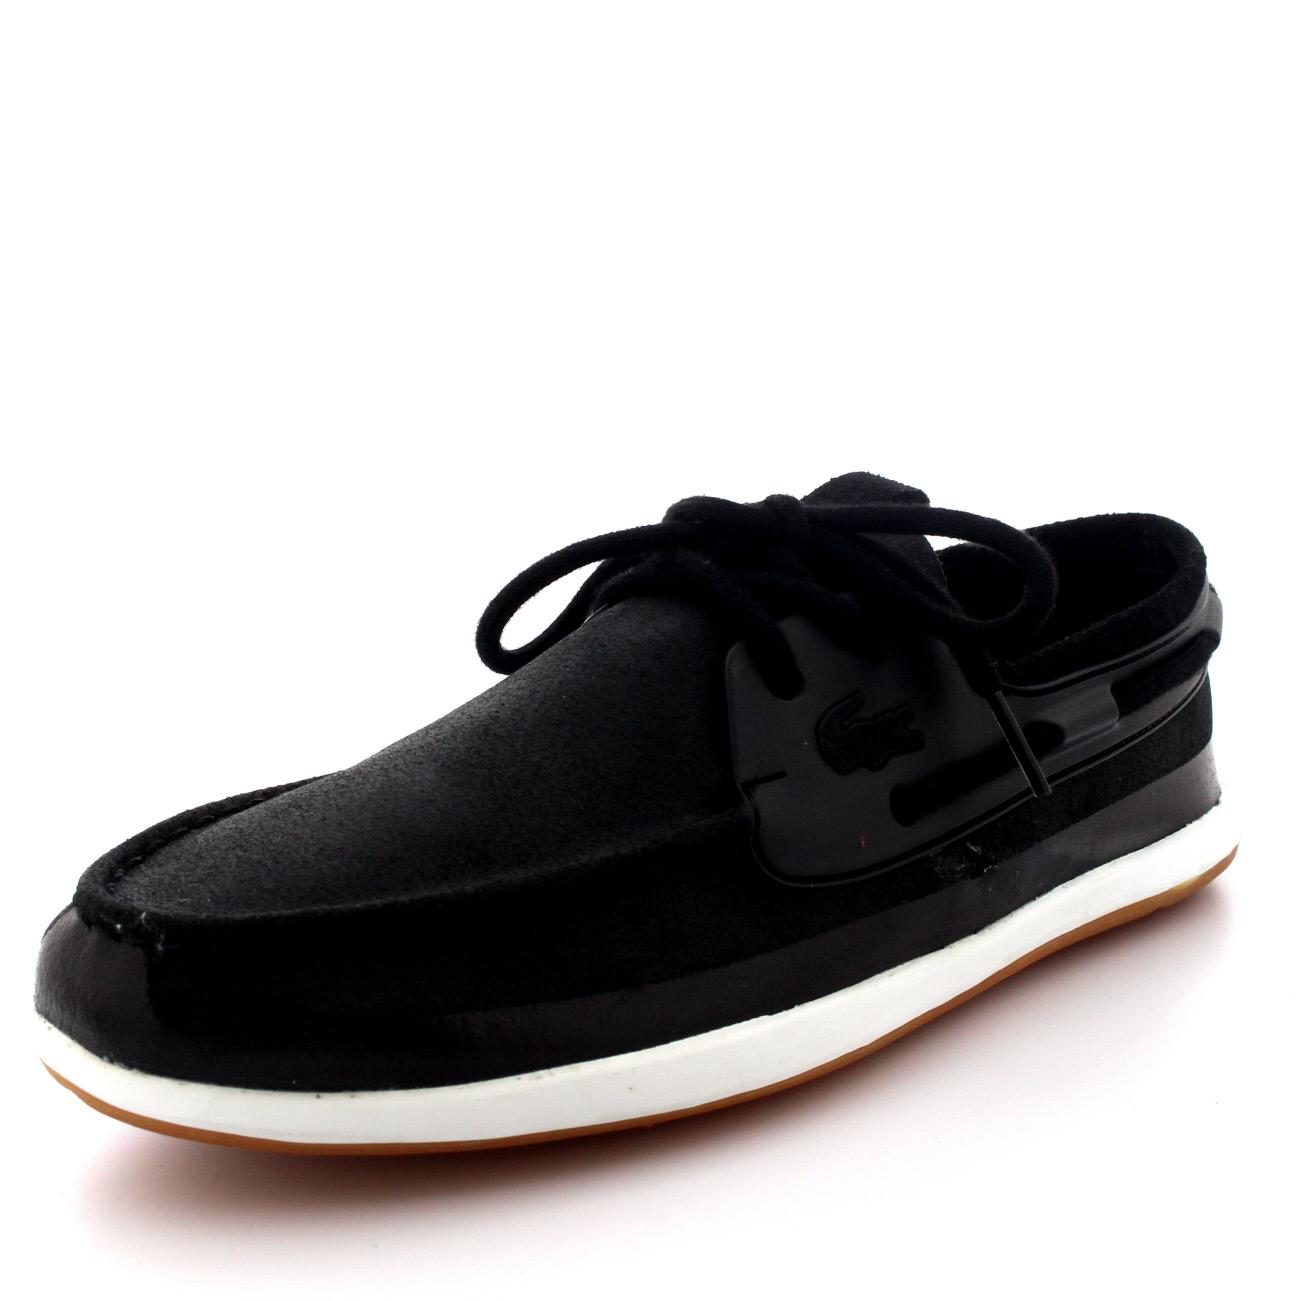 Moccasin Shoes Uk